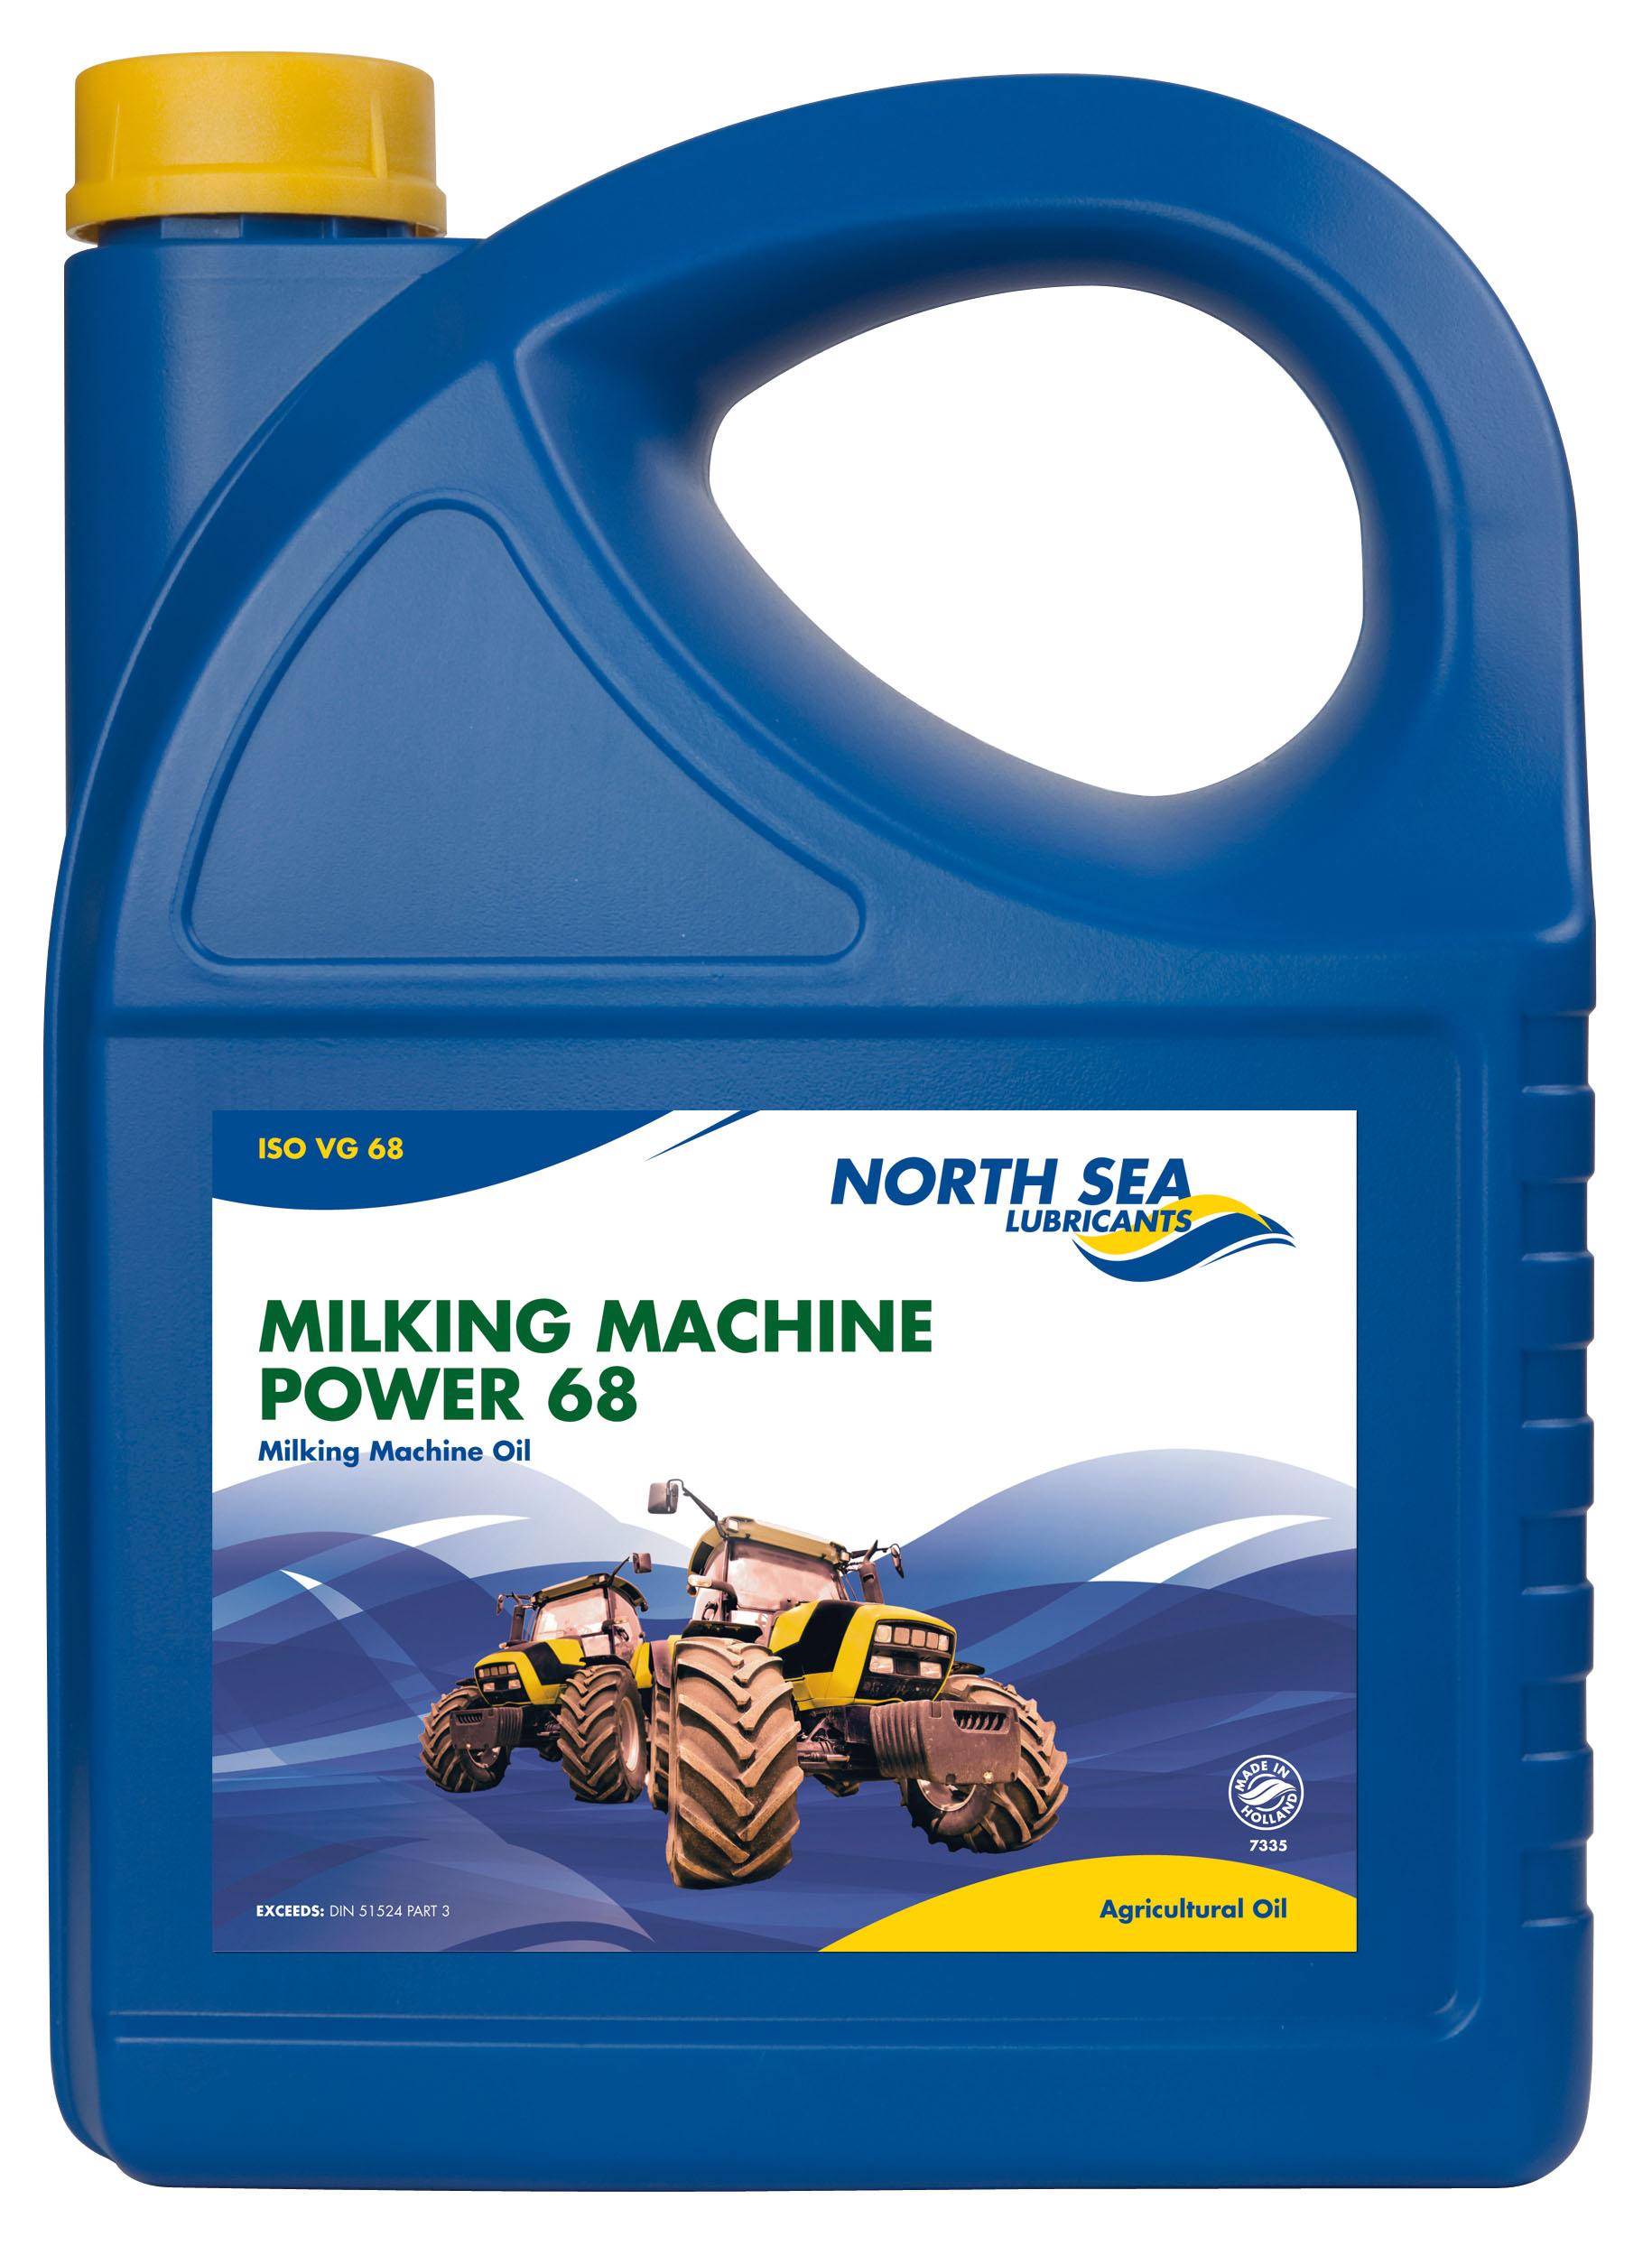 MILKING MACHINE POWER 68 λιπαντικό αρμεκτικών μηχανών